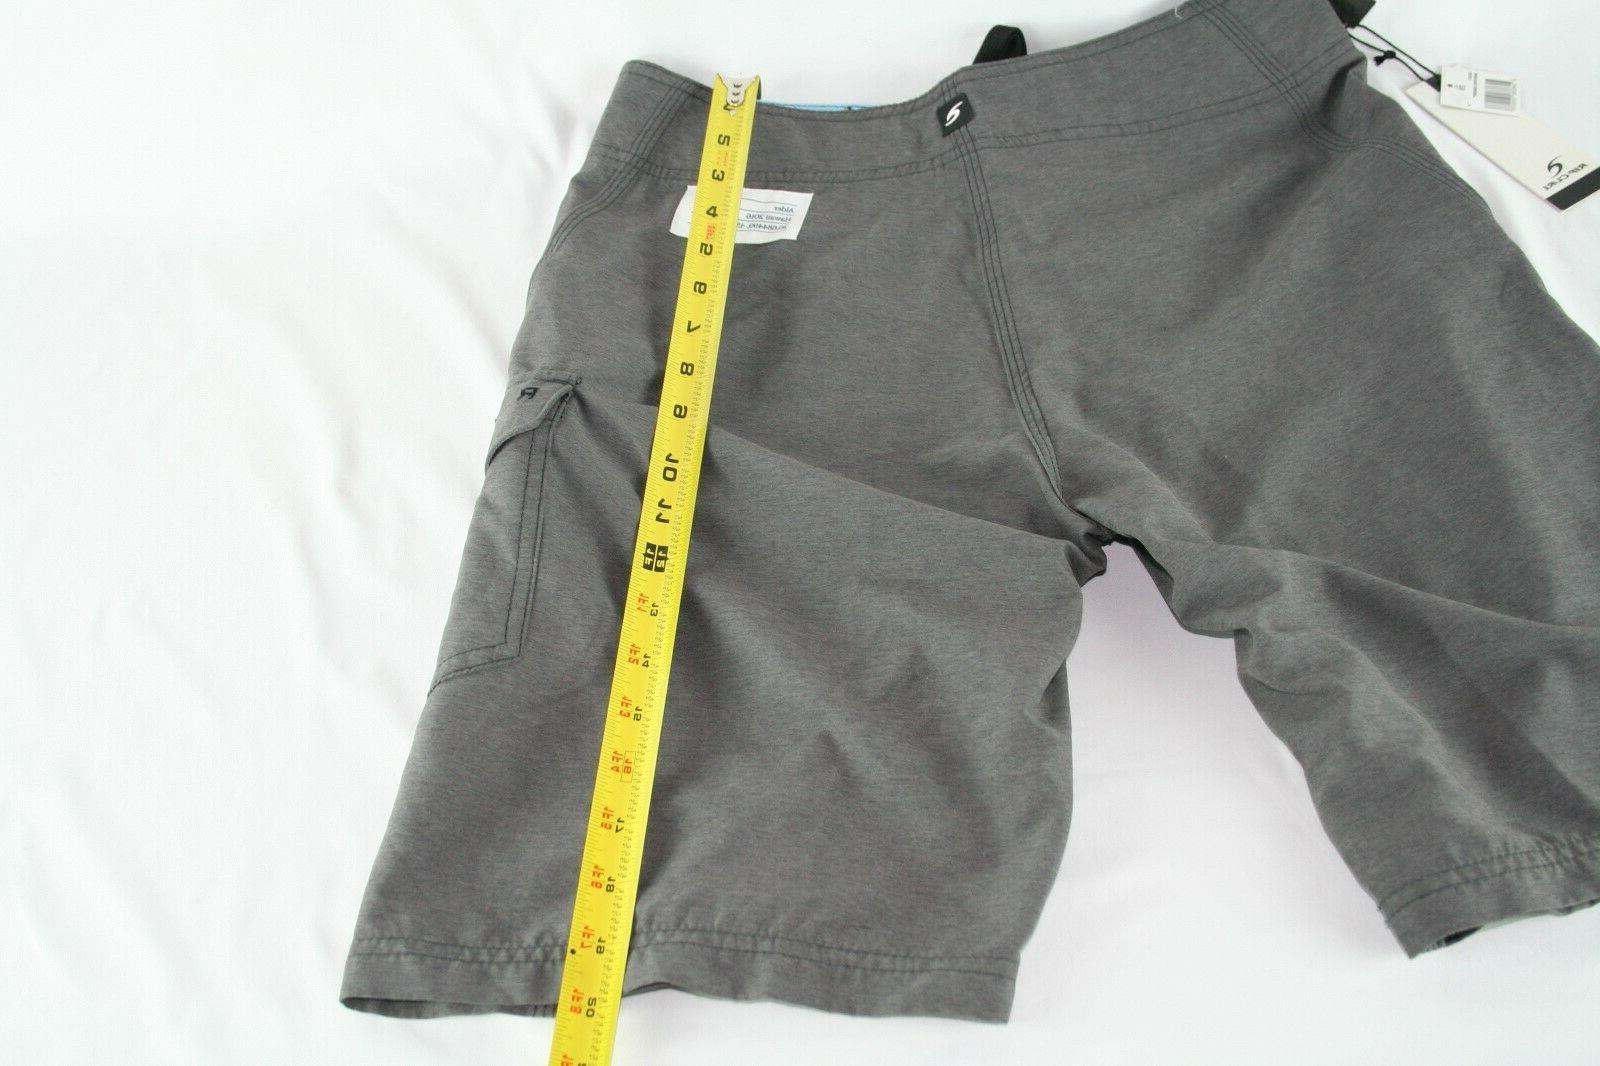 NWT Rip Size 29 Trunks Board Shorts